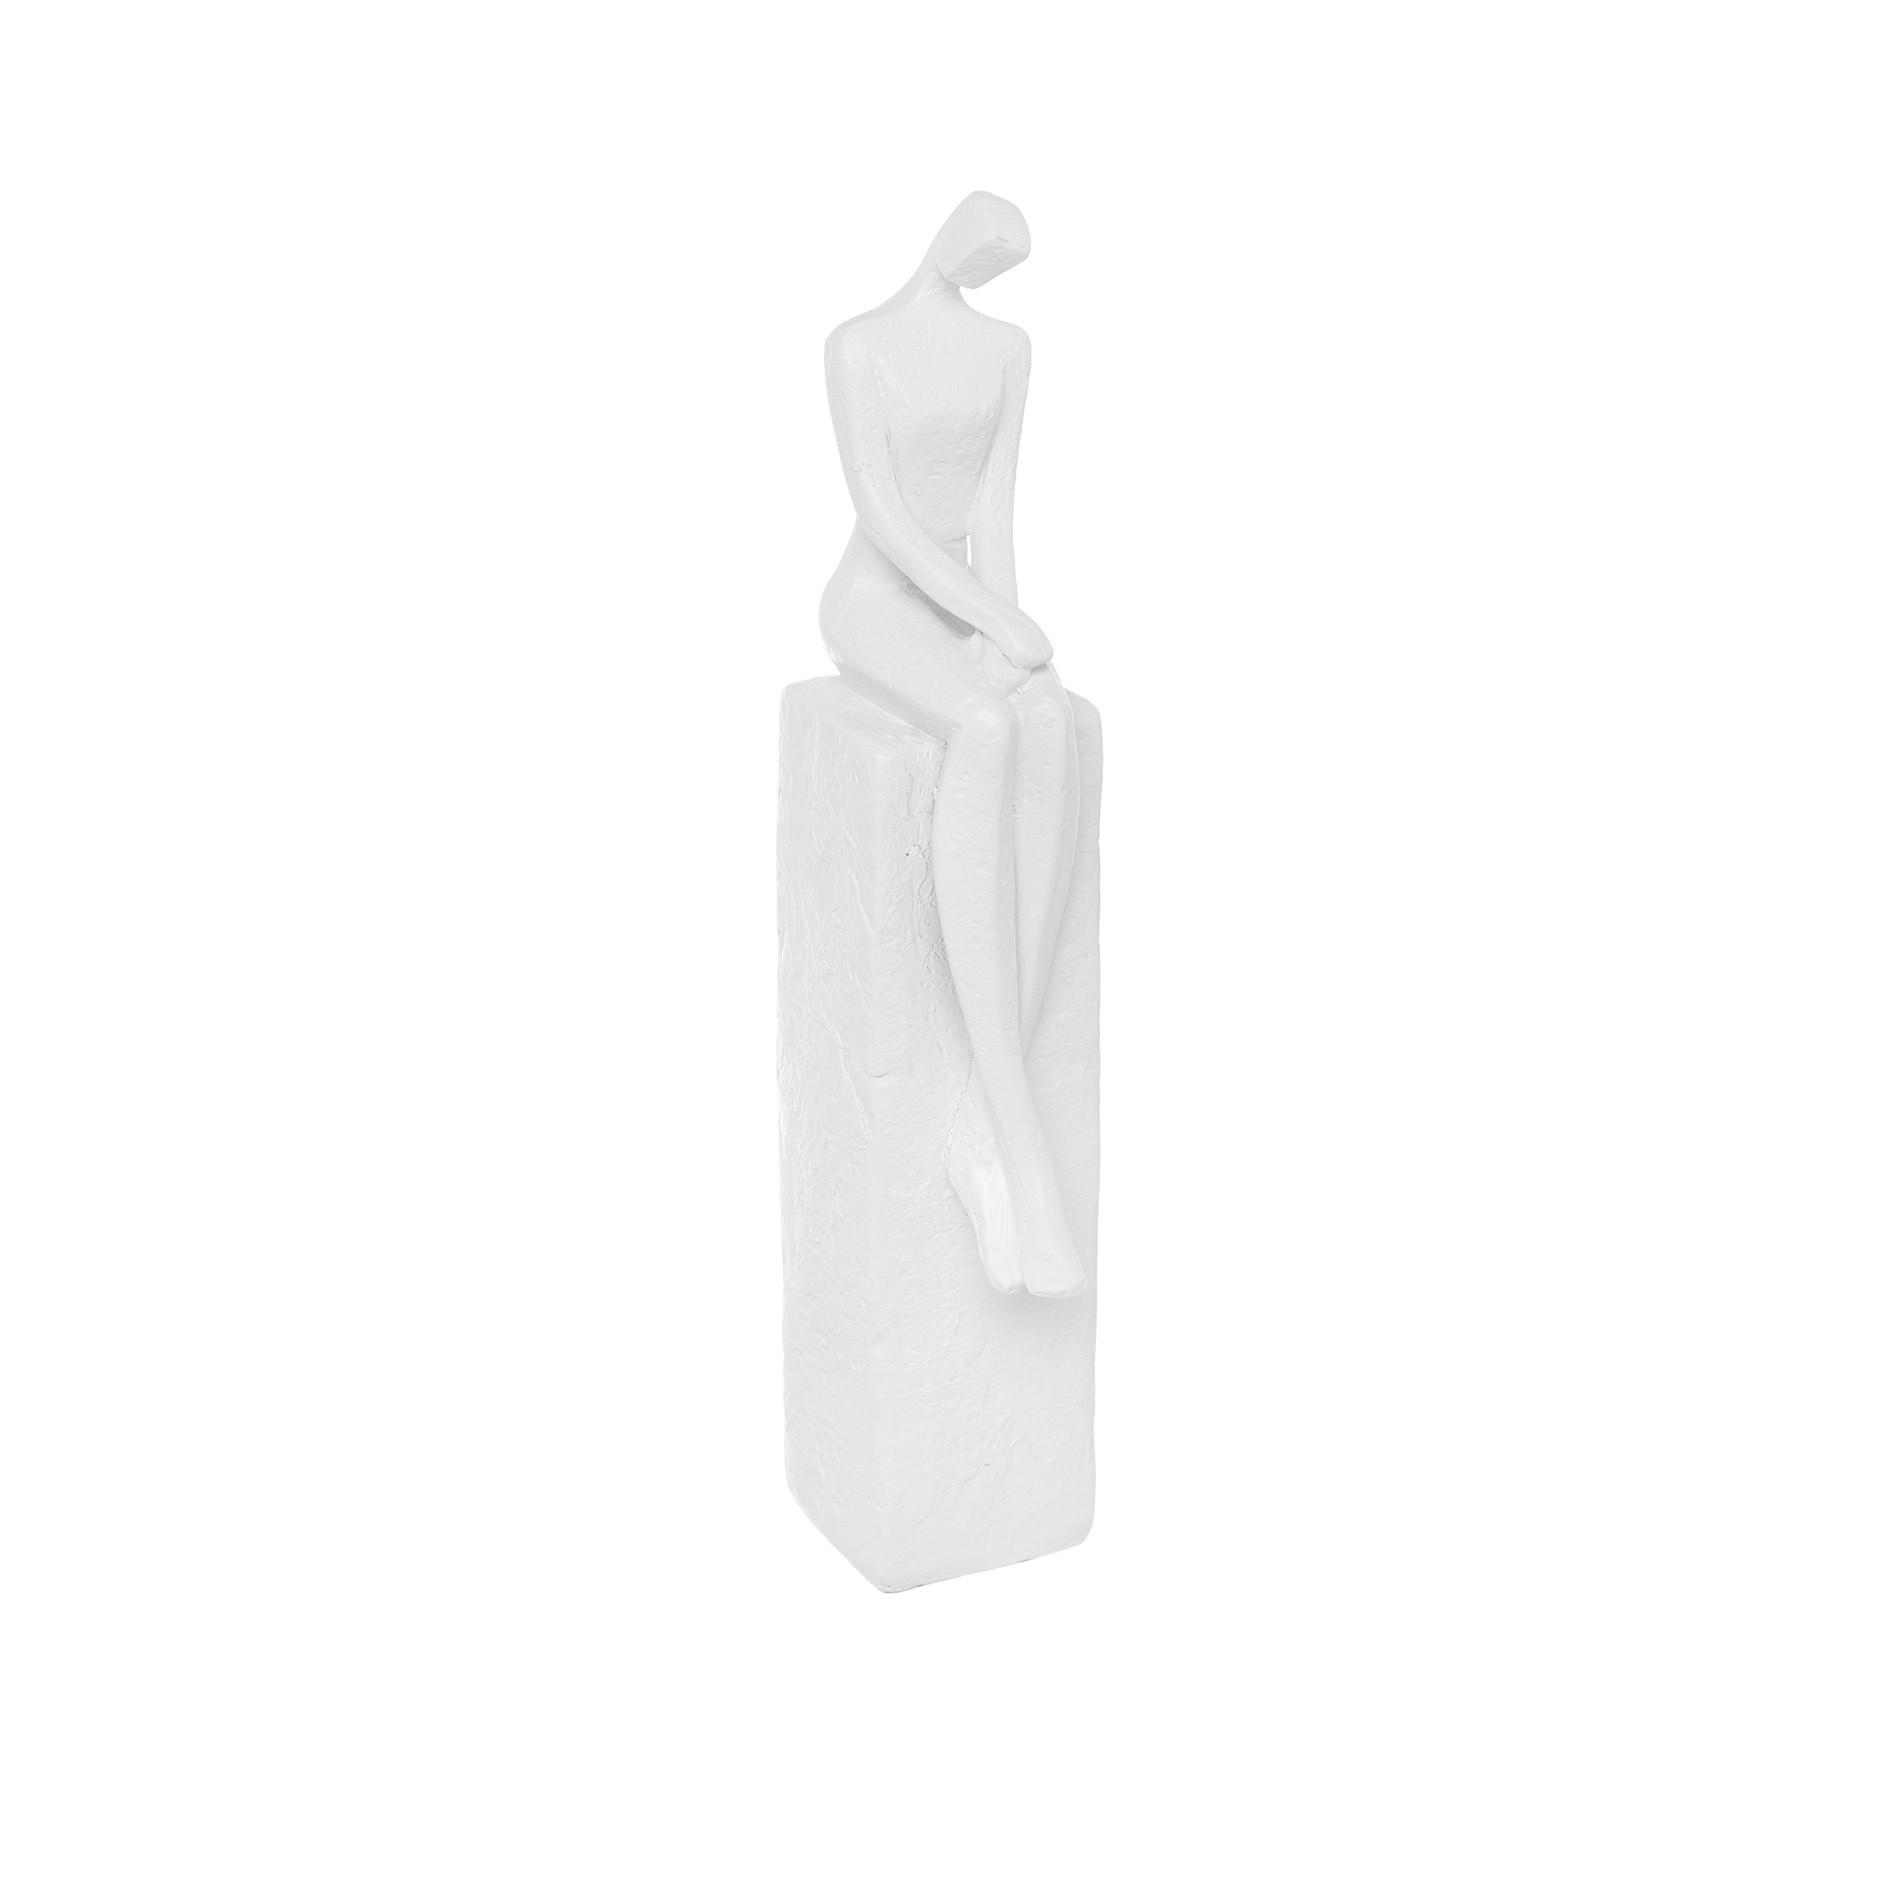 Statuetta donna seduta rifinita a mano, Bianco, large image number 0